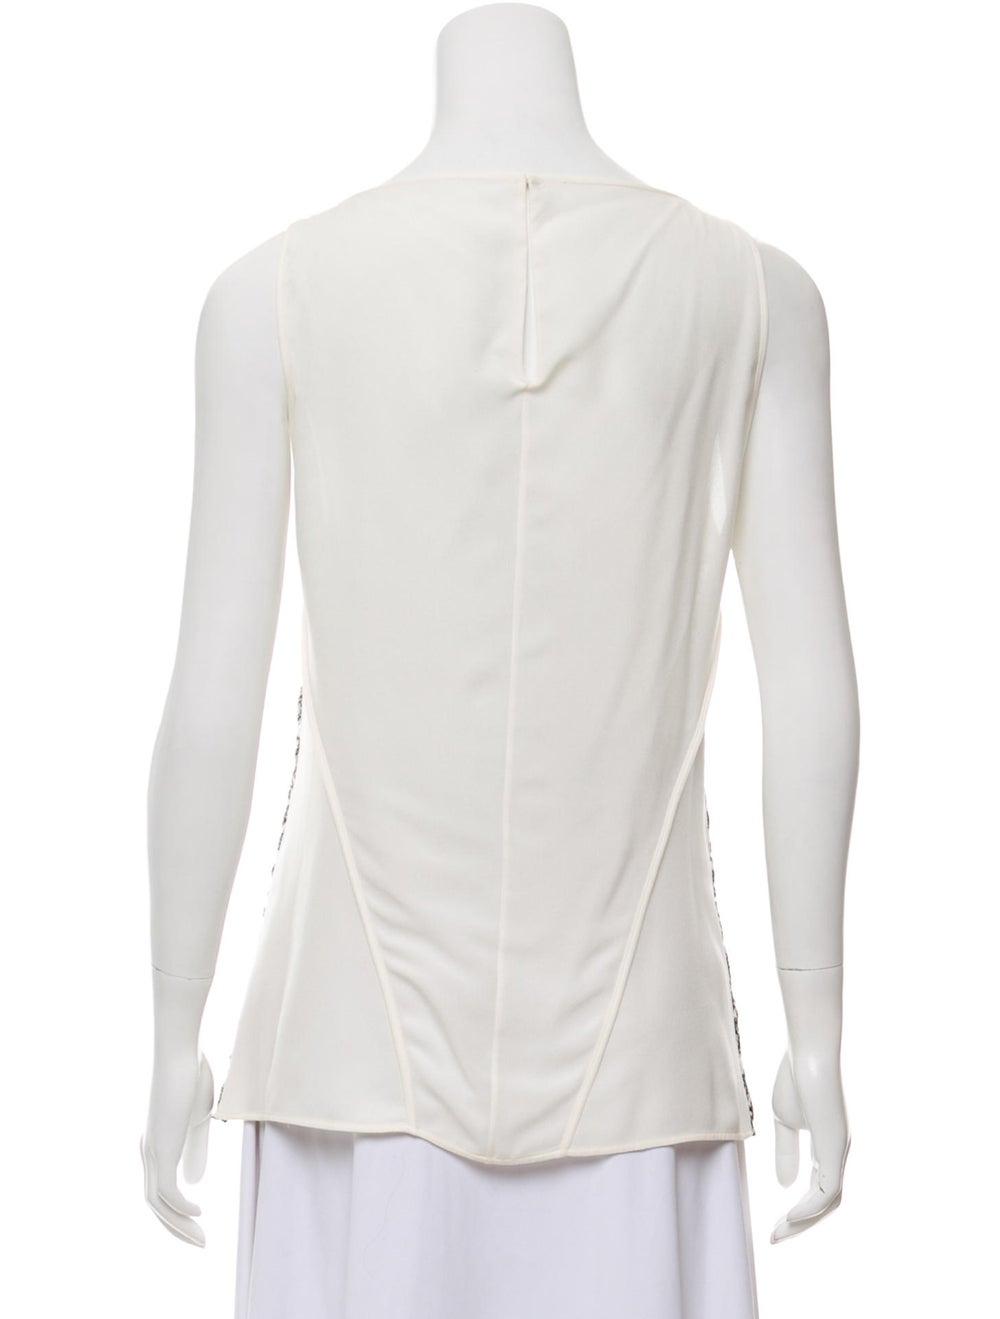 Derek Lam Sleeveless Lace Blouse White - image 3